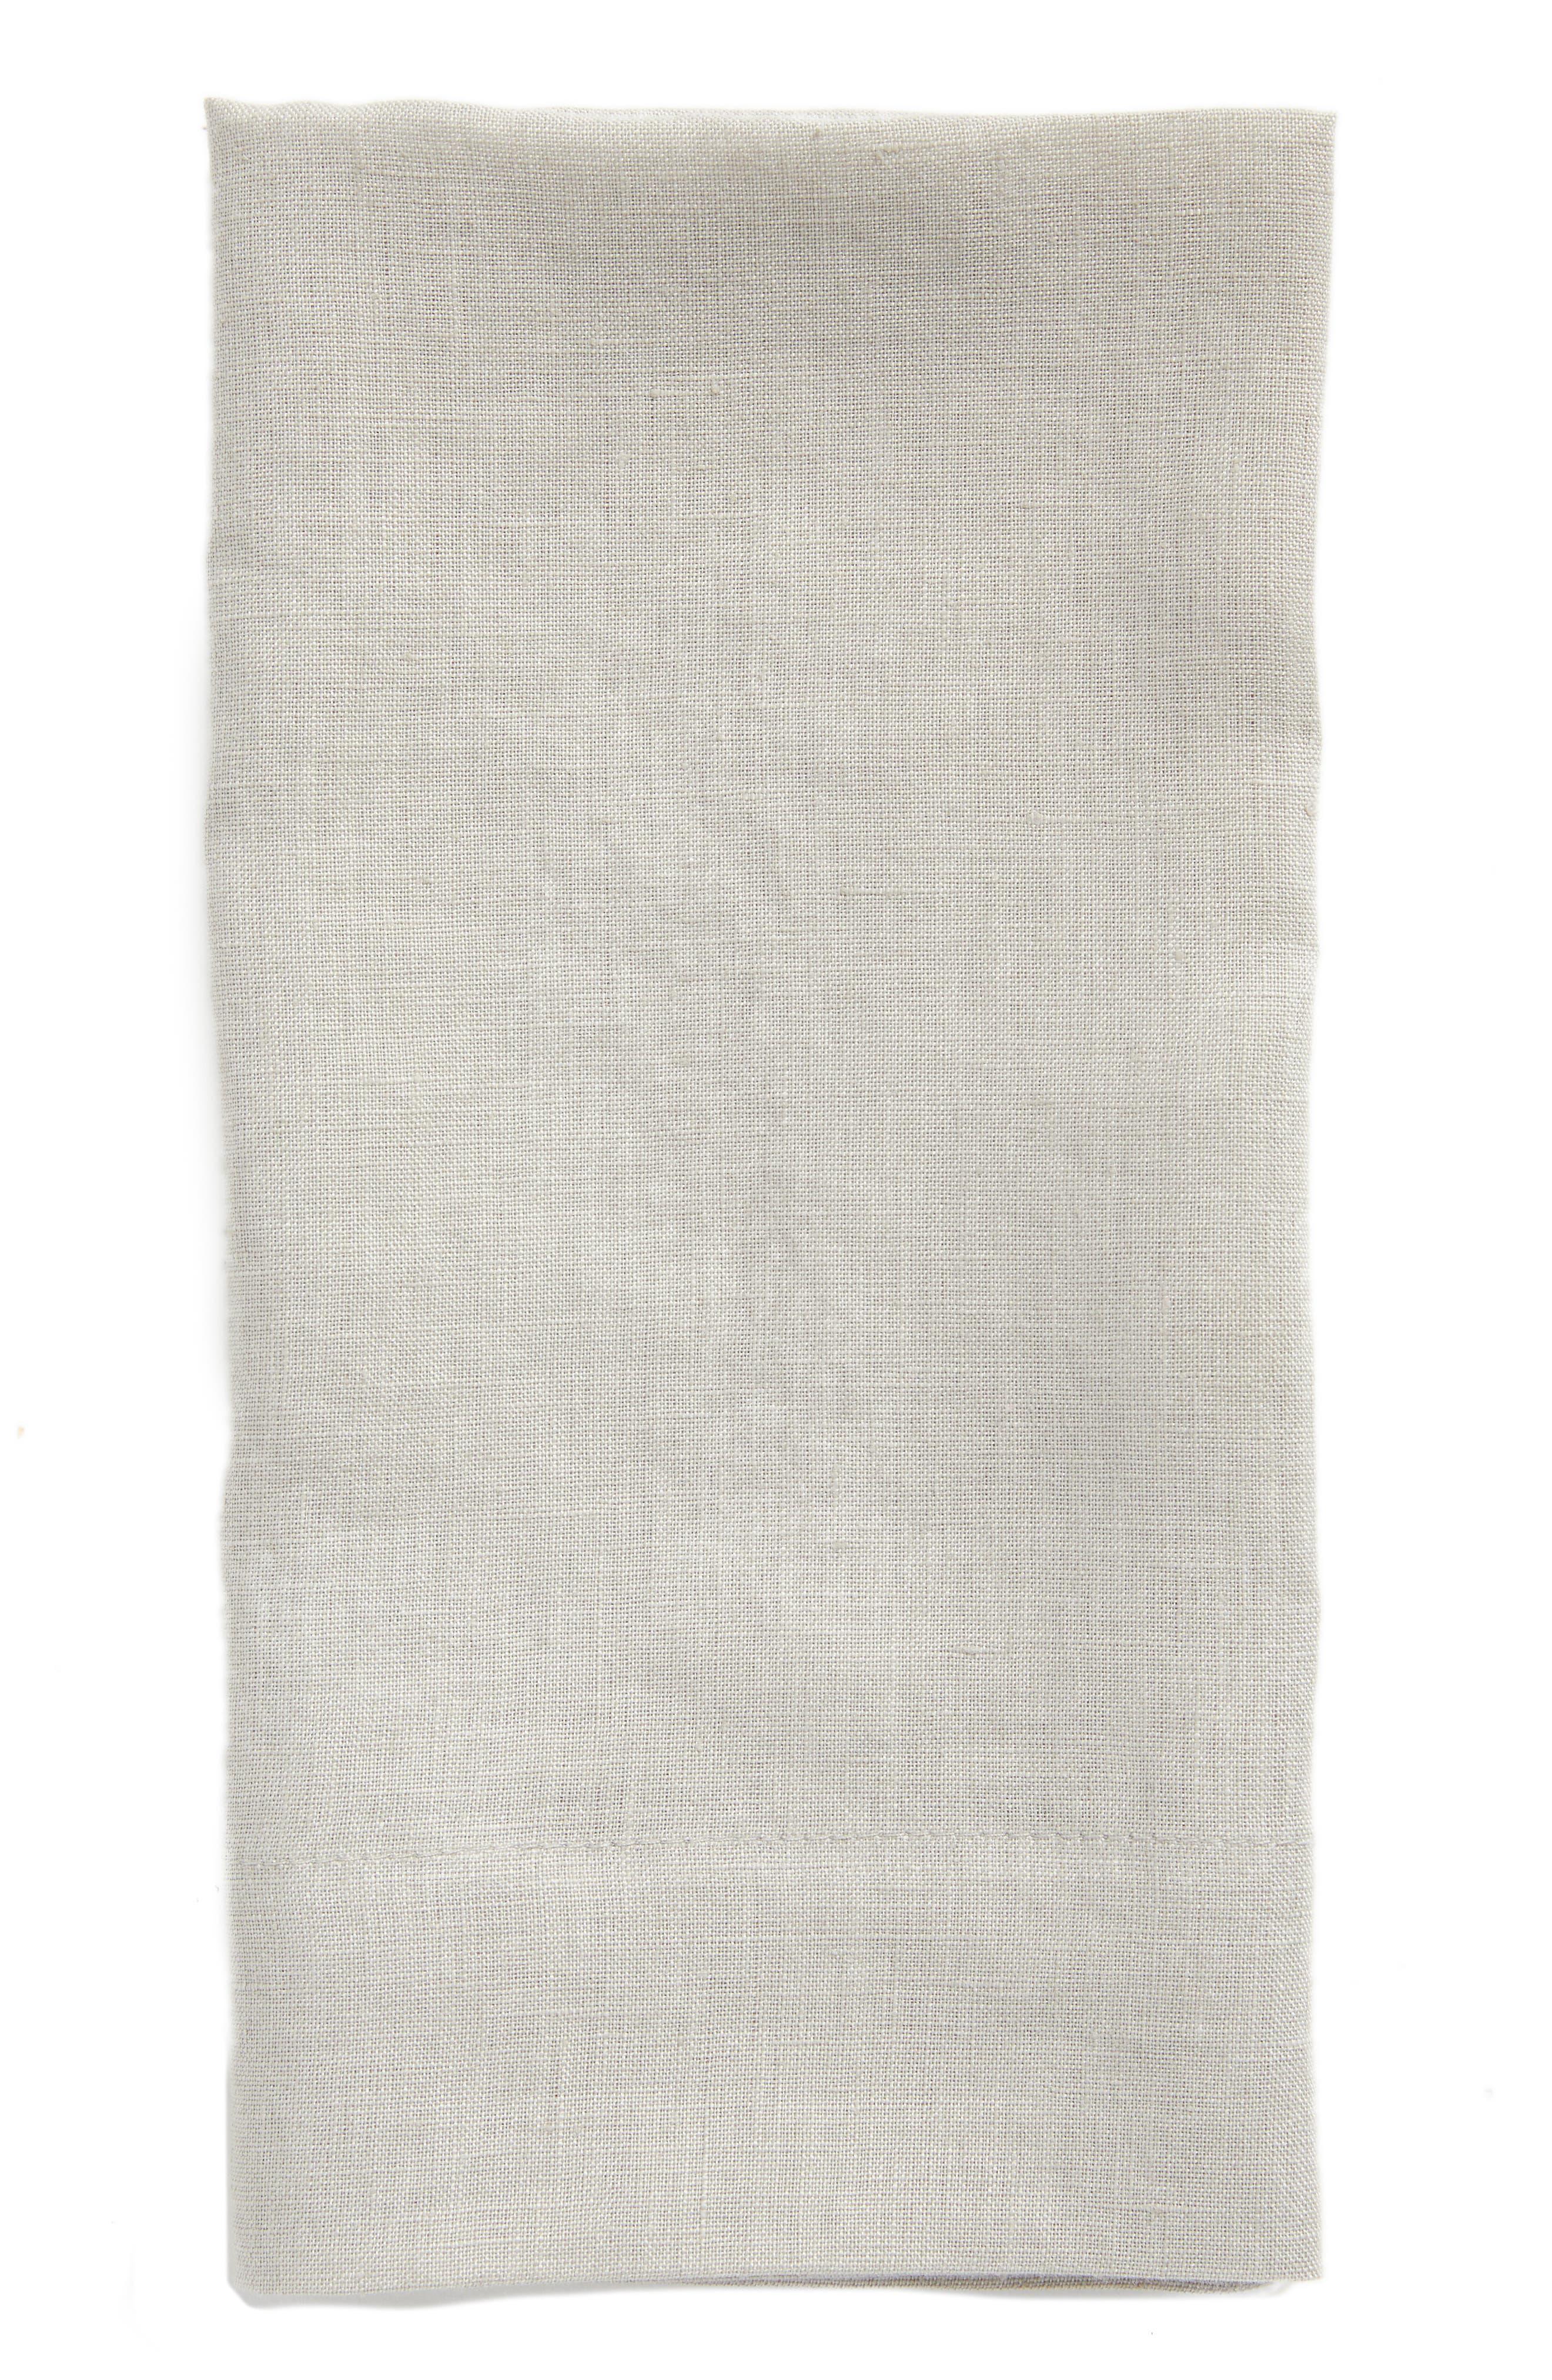 Washed Linen Napkin,                         Main,                         color, 020